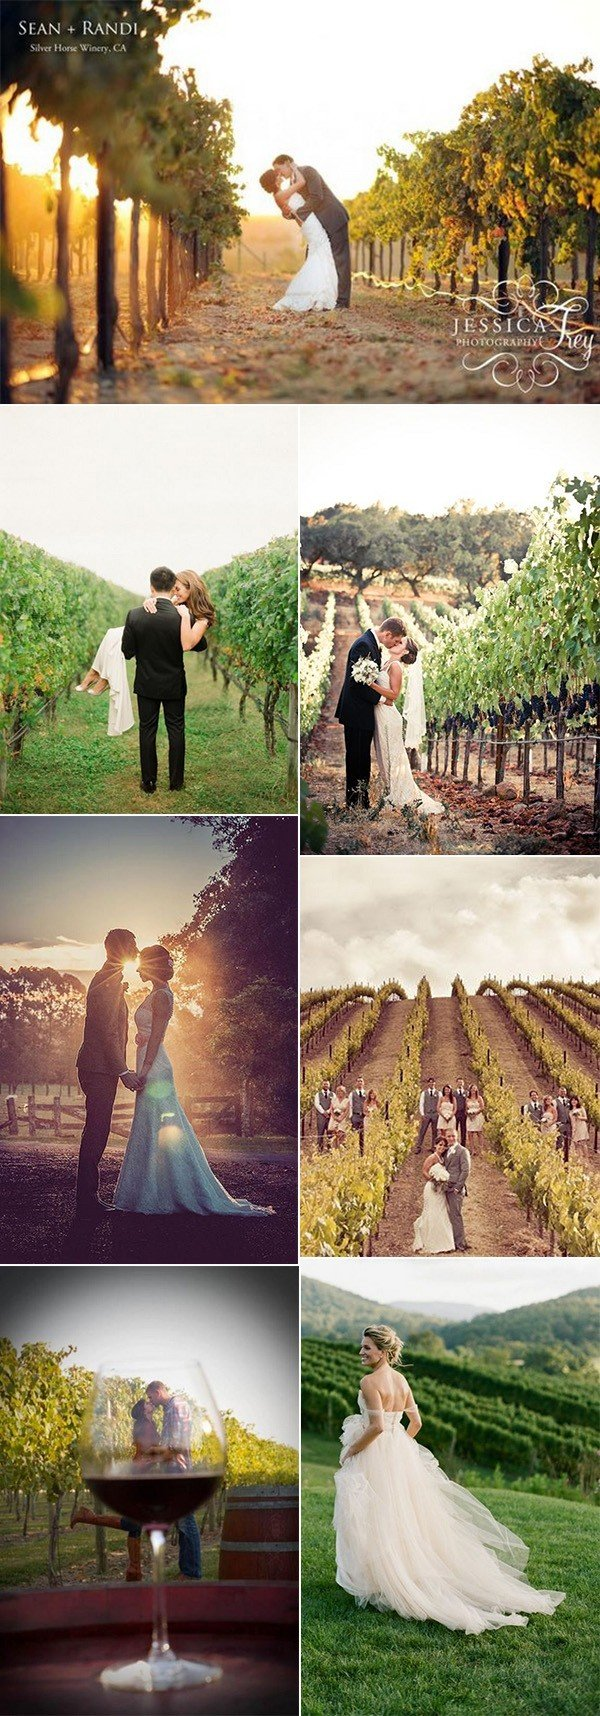 vineyard themed wedding photo ideas for 2018